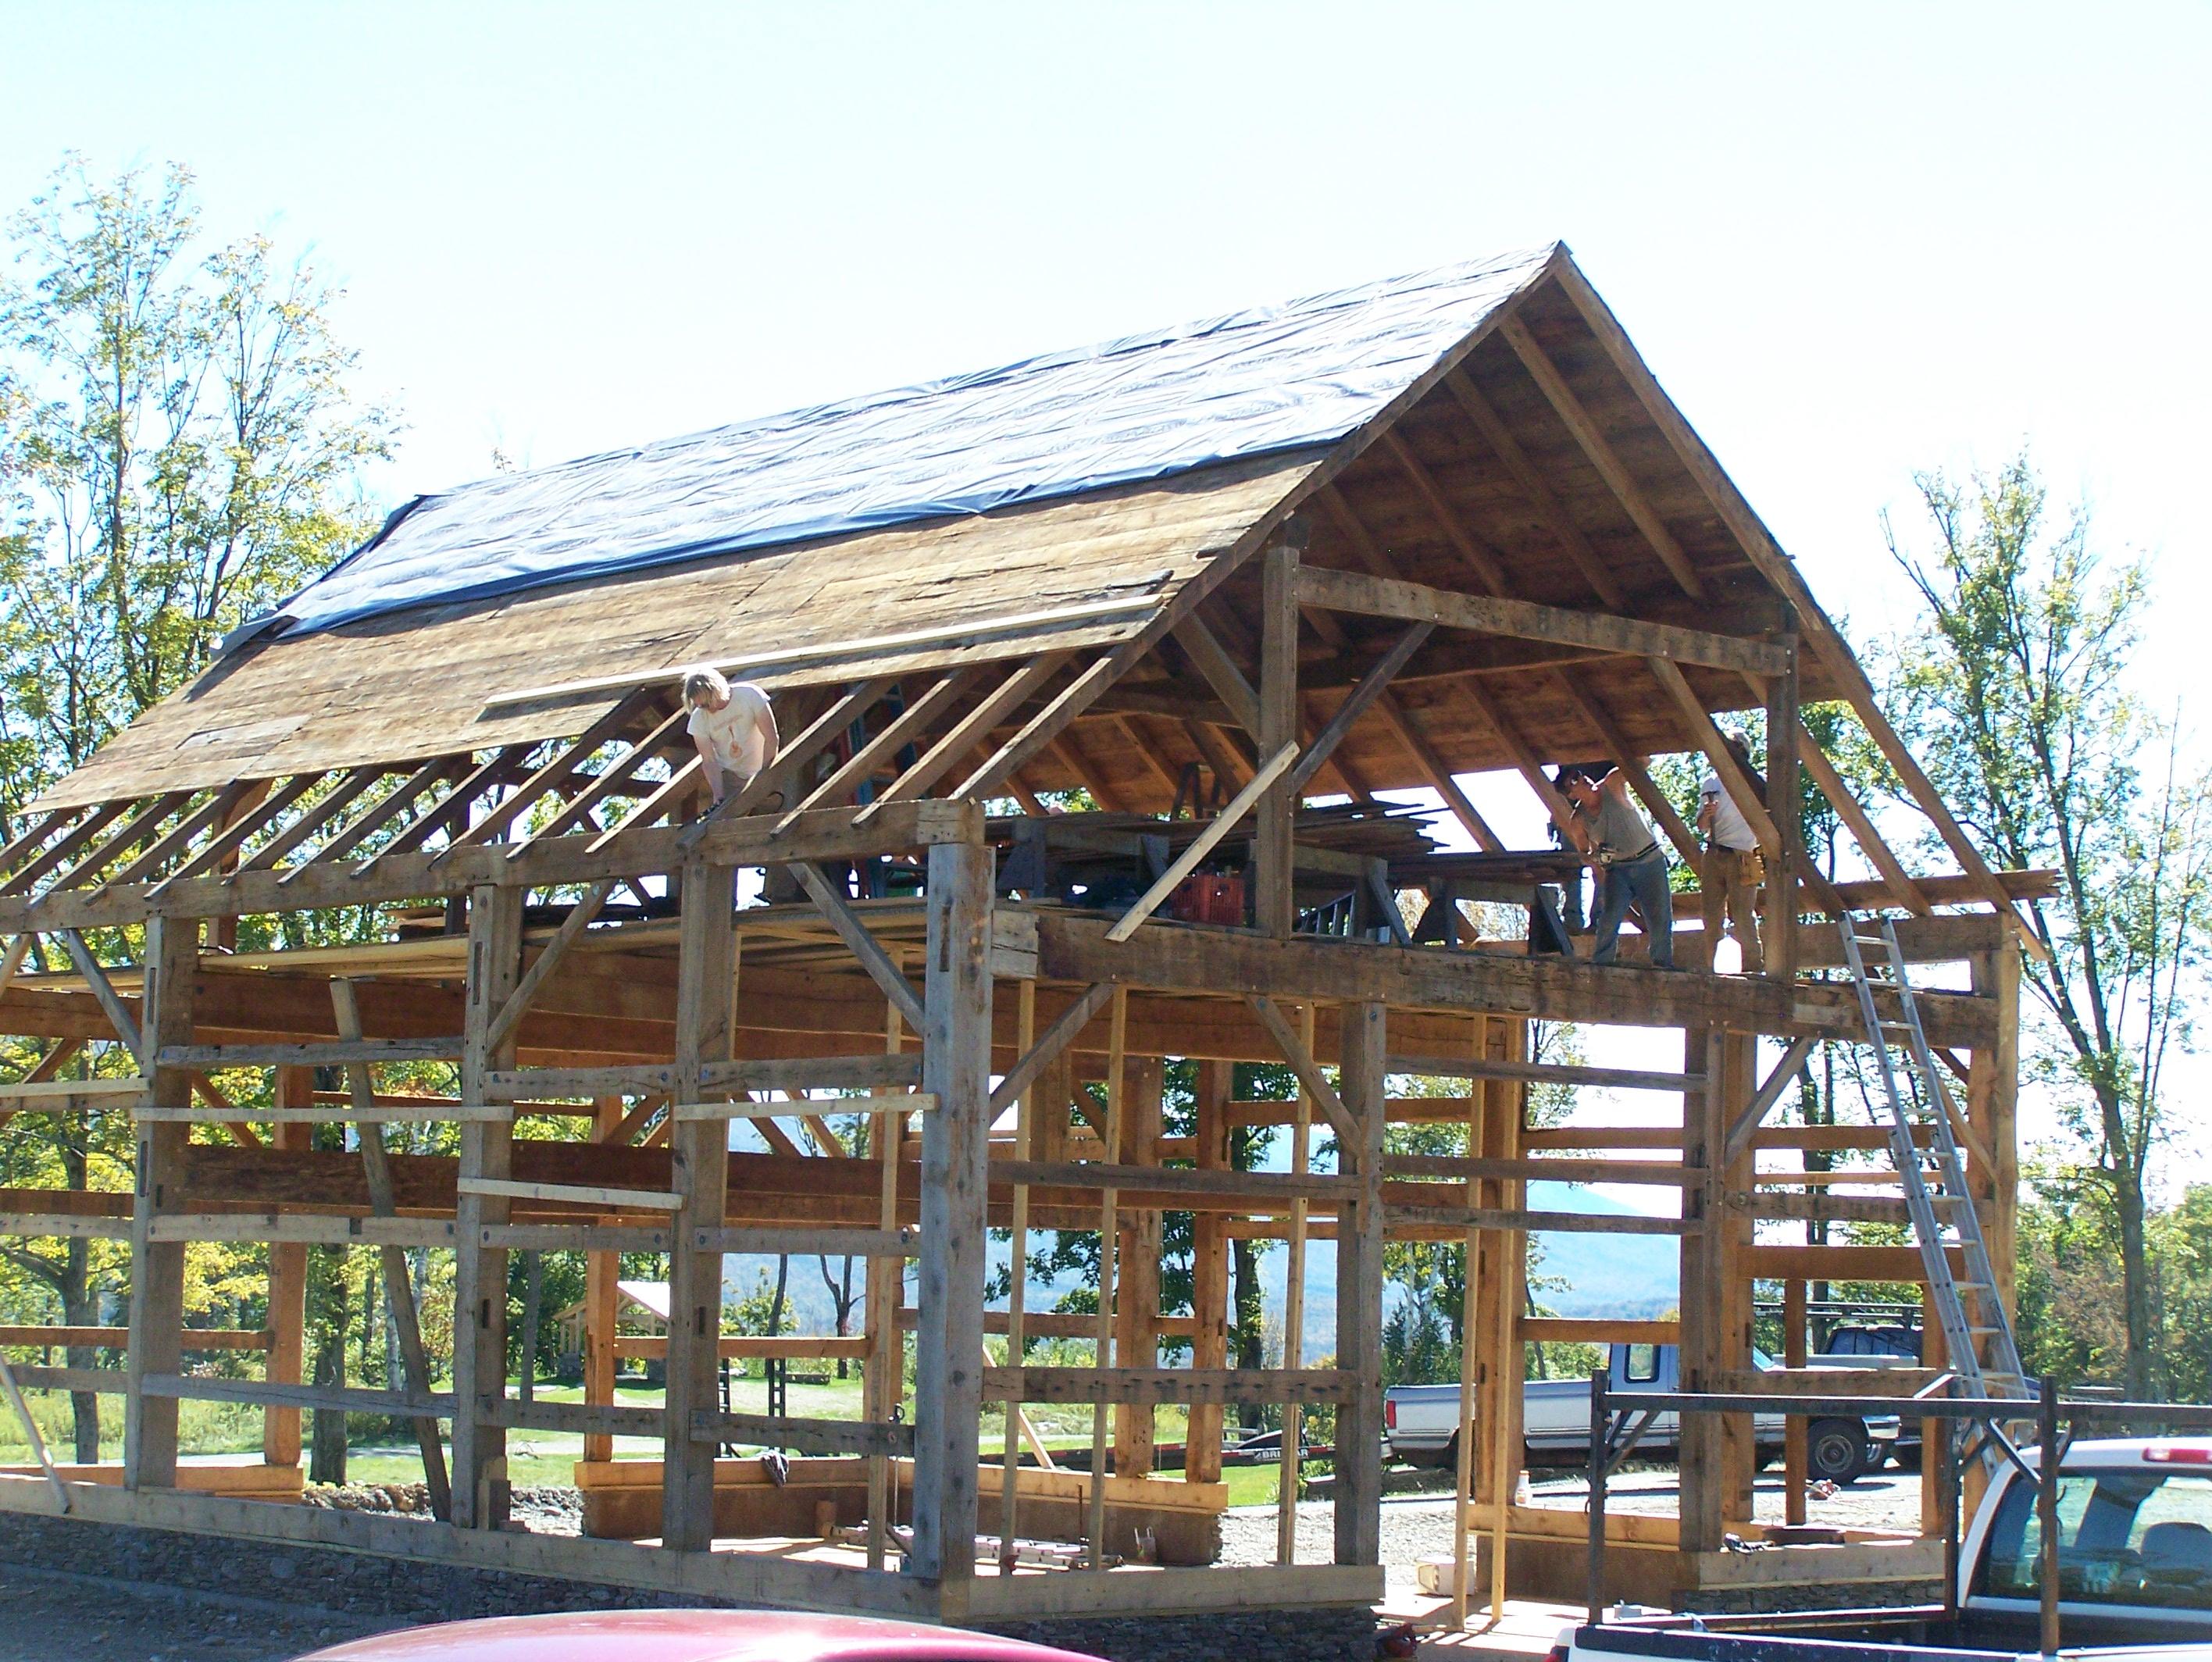 Saving Old Barns Green Mountain Timber Frames